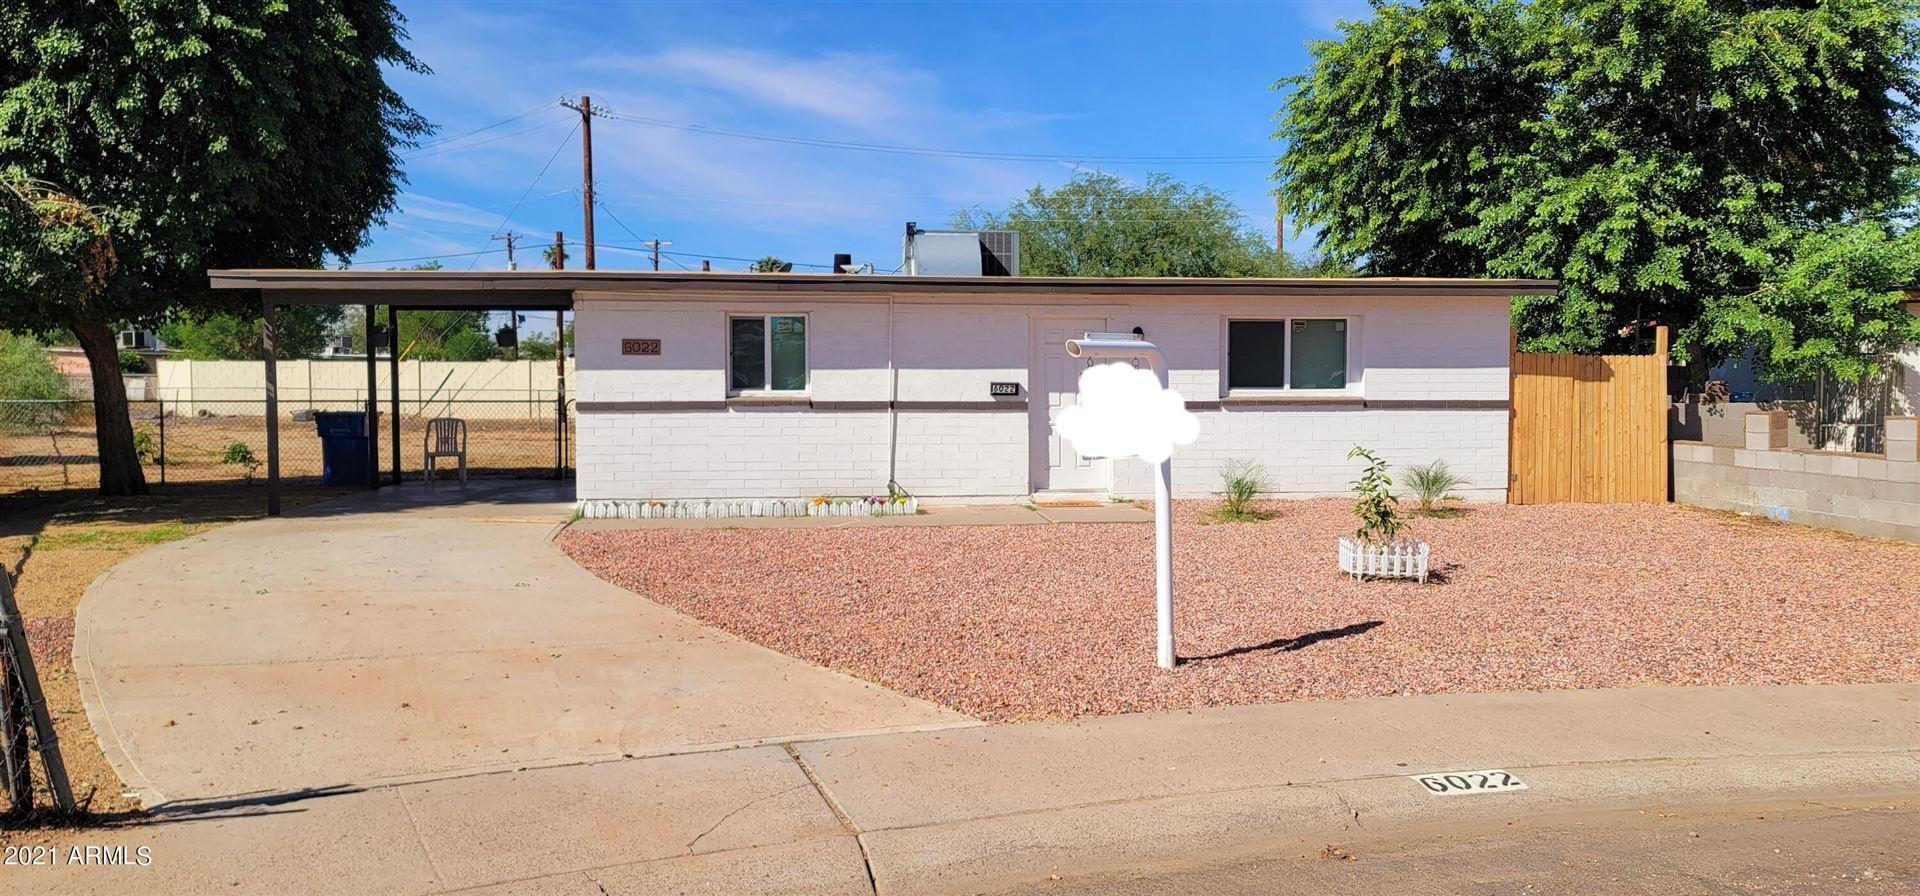 6022 S 23RD Street S, Phoenix, AZ 85042 - MLS#: 6270891